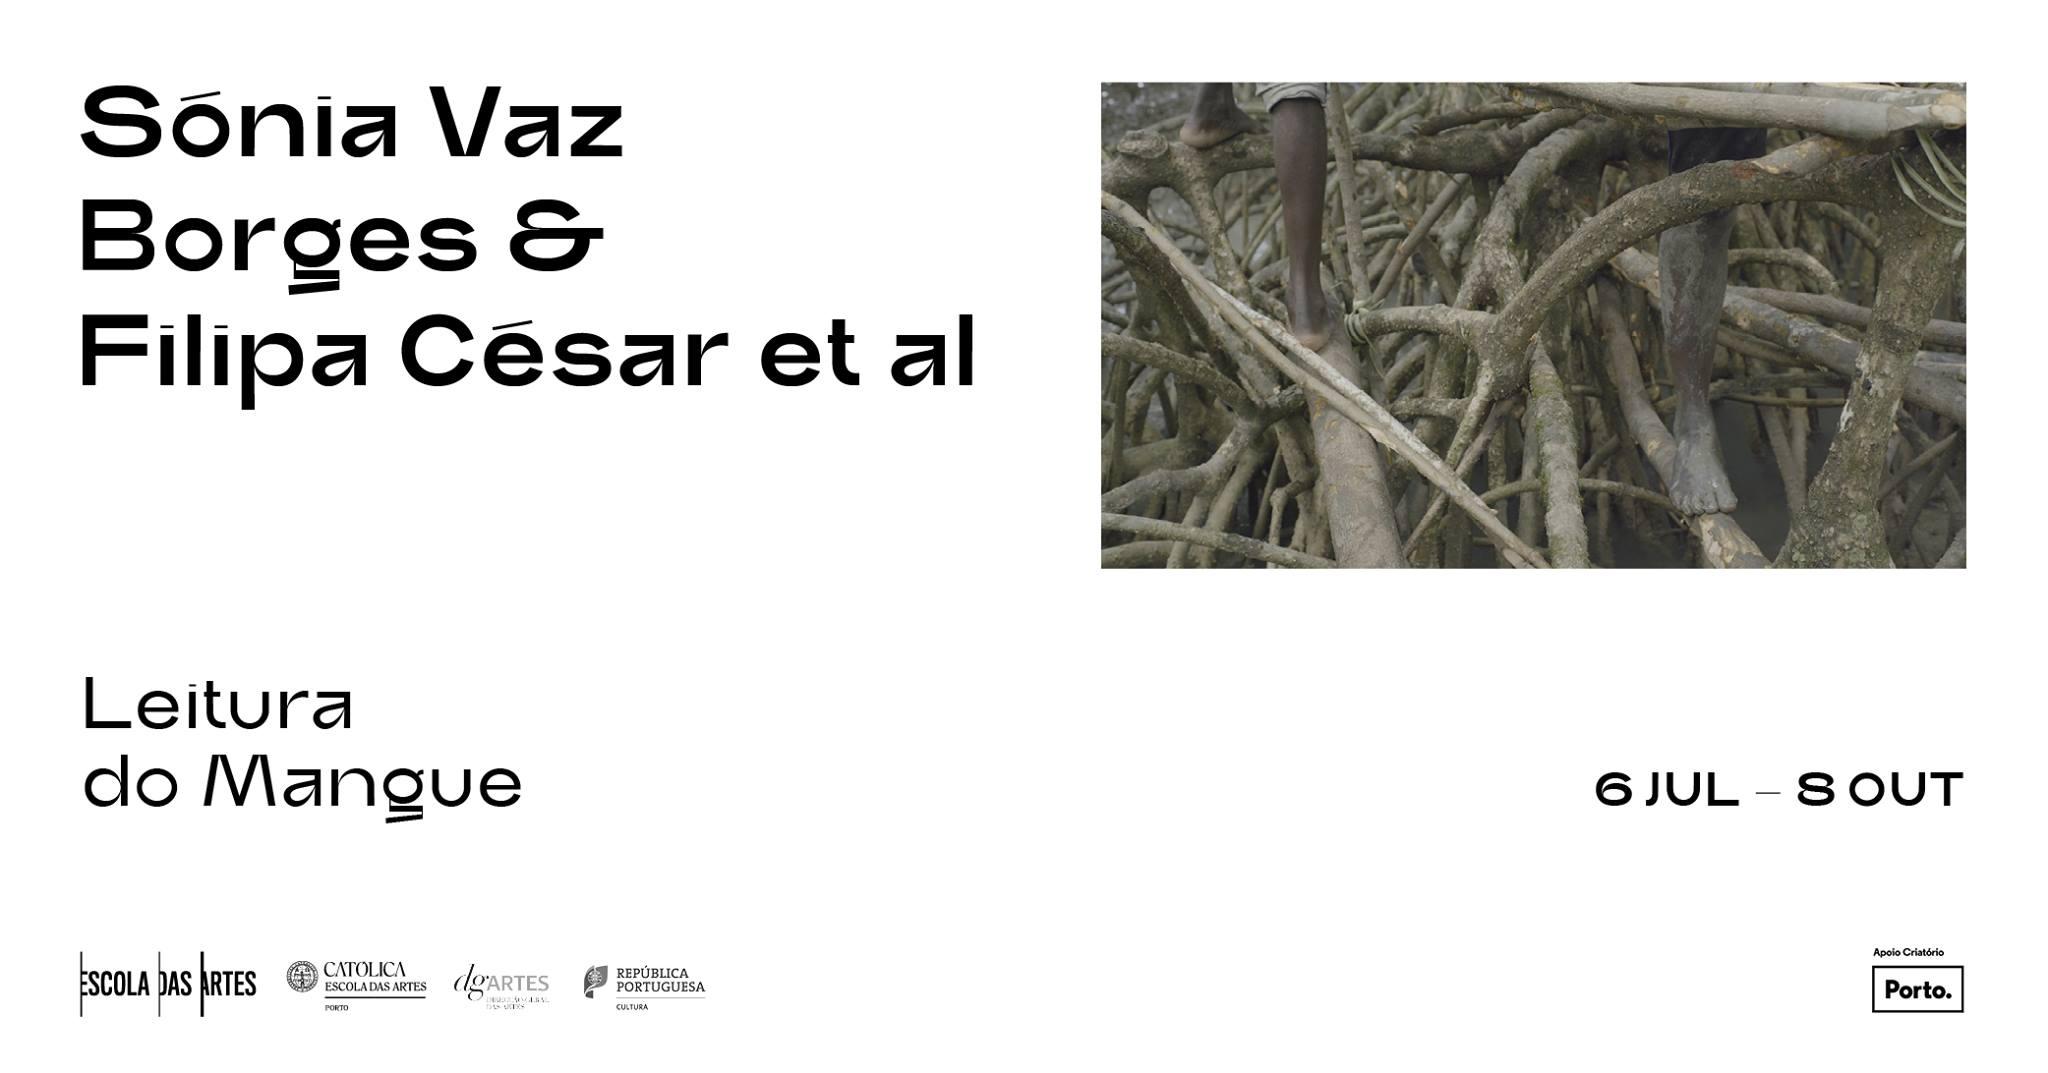 Sónia Vaz Borges & Filipa César et al · Leitura do Mangue